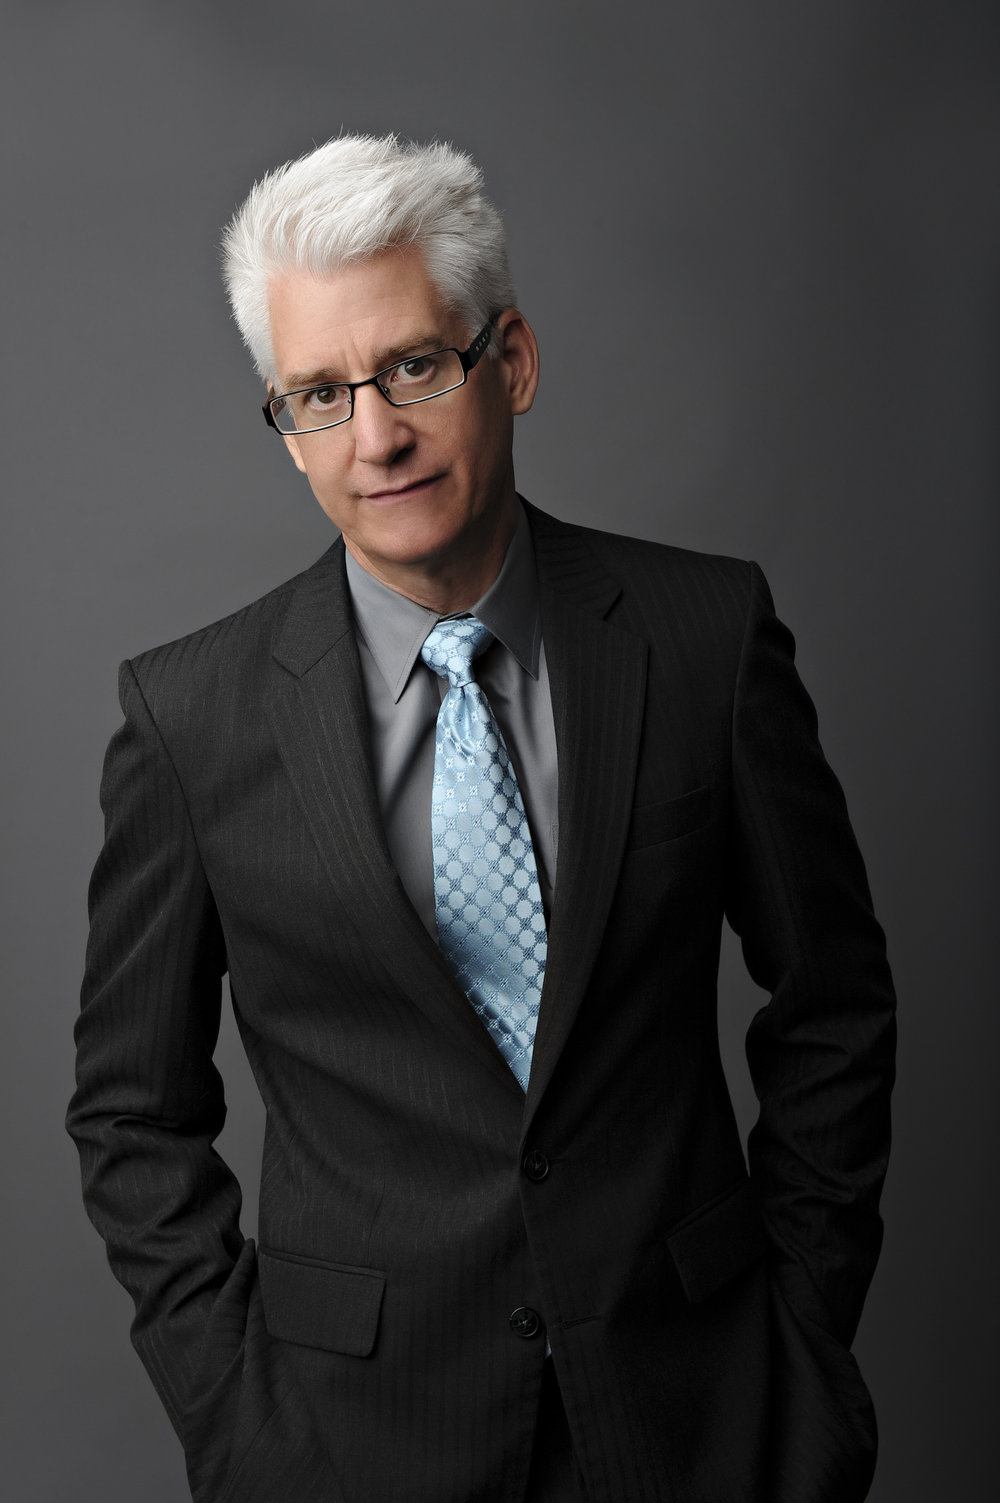 21st Century Relationship Speaker, Trainer, Coach Steve Hultquist